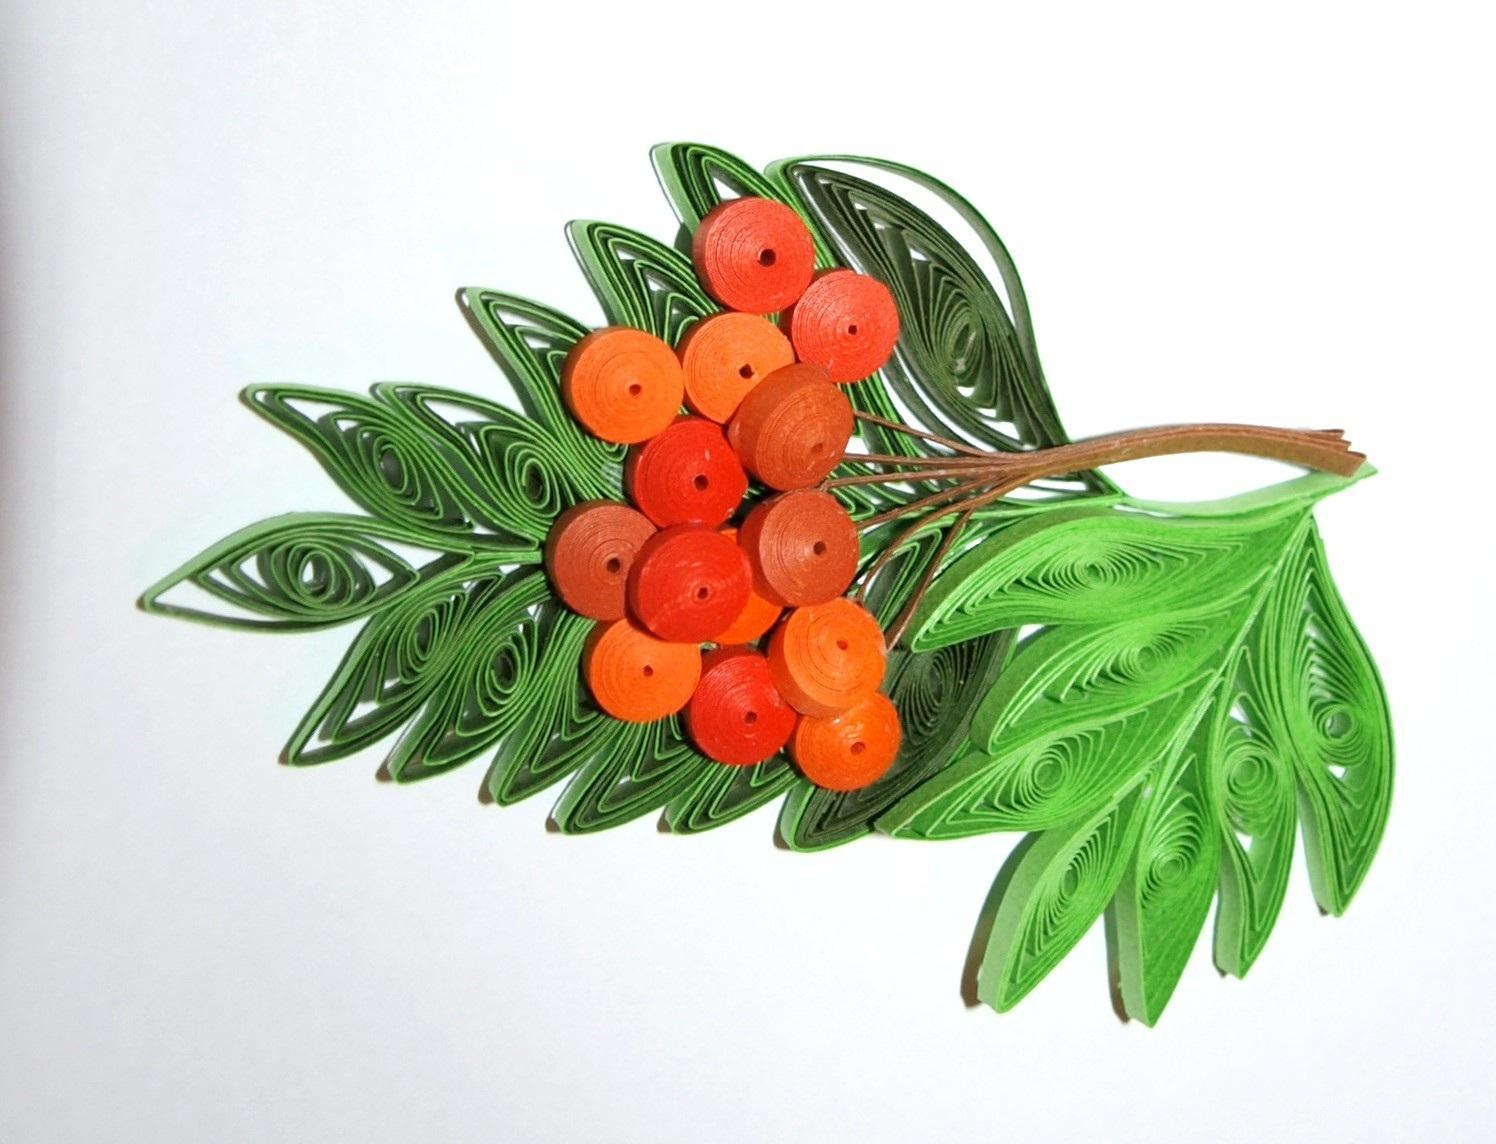 kvilling_ryabina_ris.16_ Рябина квиллинг: осеннее дерево из бумаги в фото МК